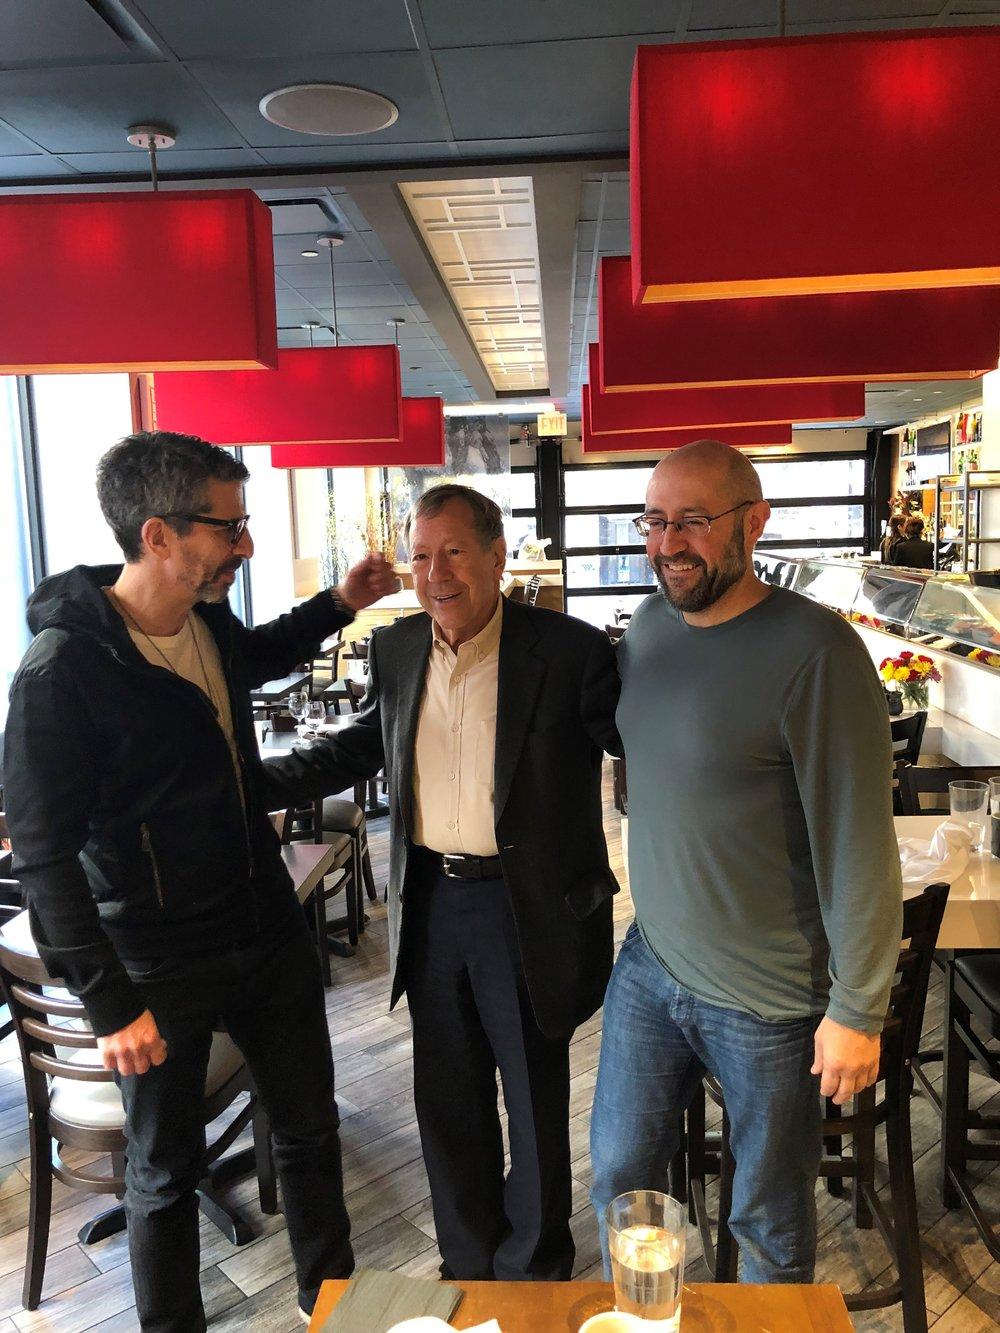 RCI - Jason Flom, Irwin Cotler & Jay Rosenzweig 20190215b.jpg